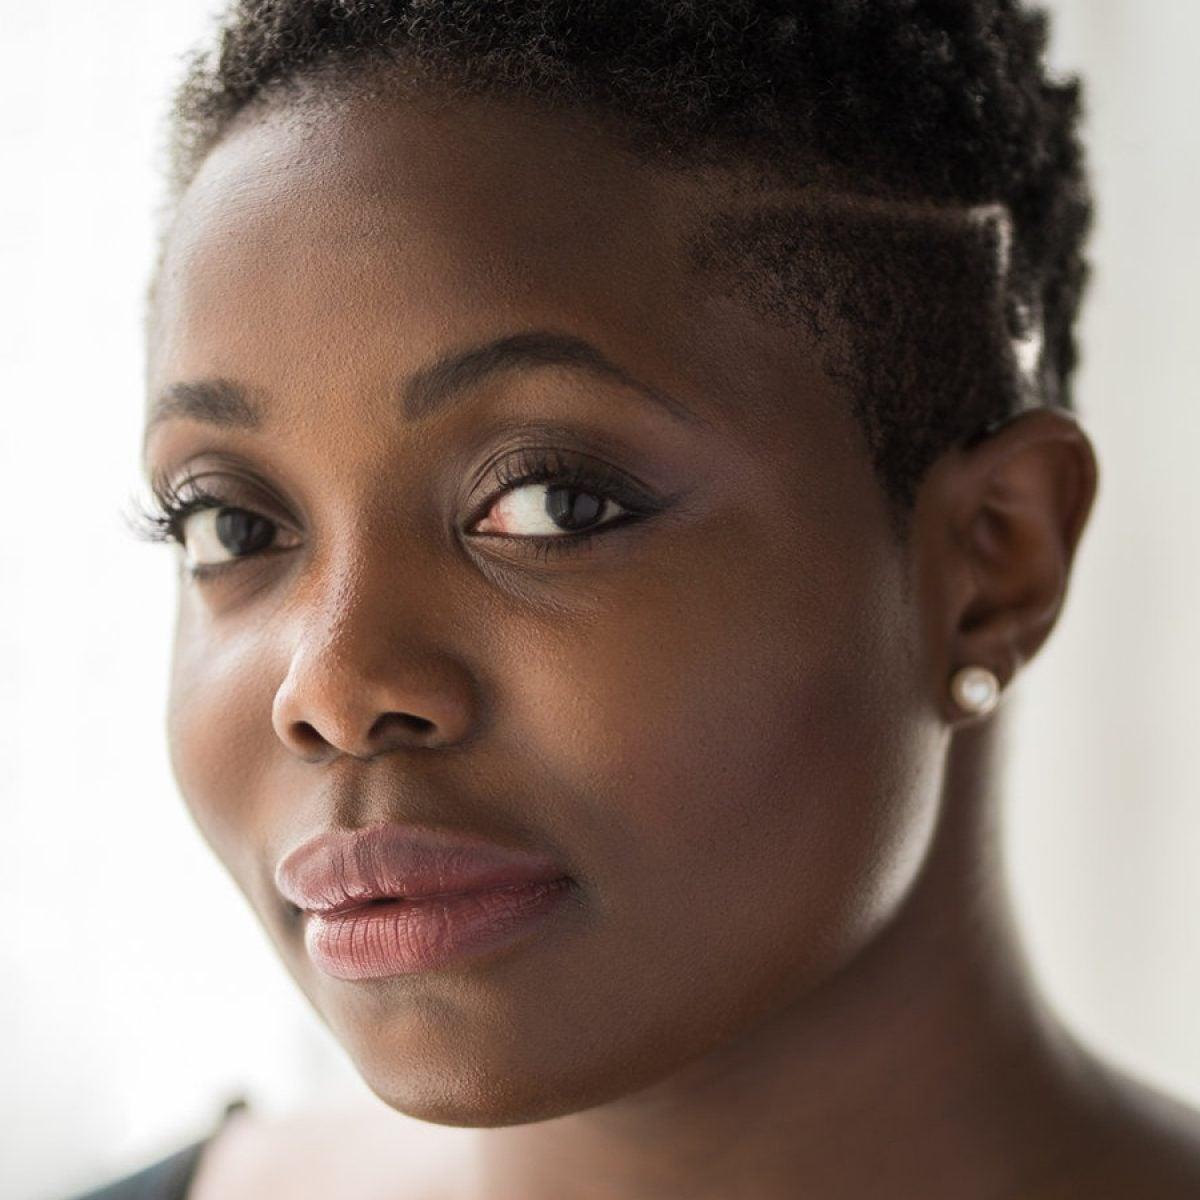 Kelechi Okafor Says Black Women Deserve Equity Not Exposure: 'I'm Not A Grateful Black Woman'